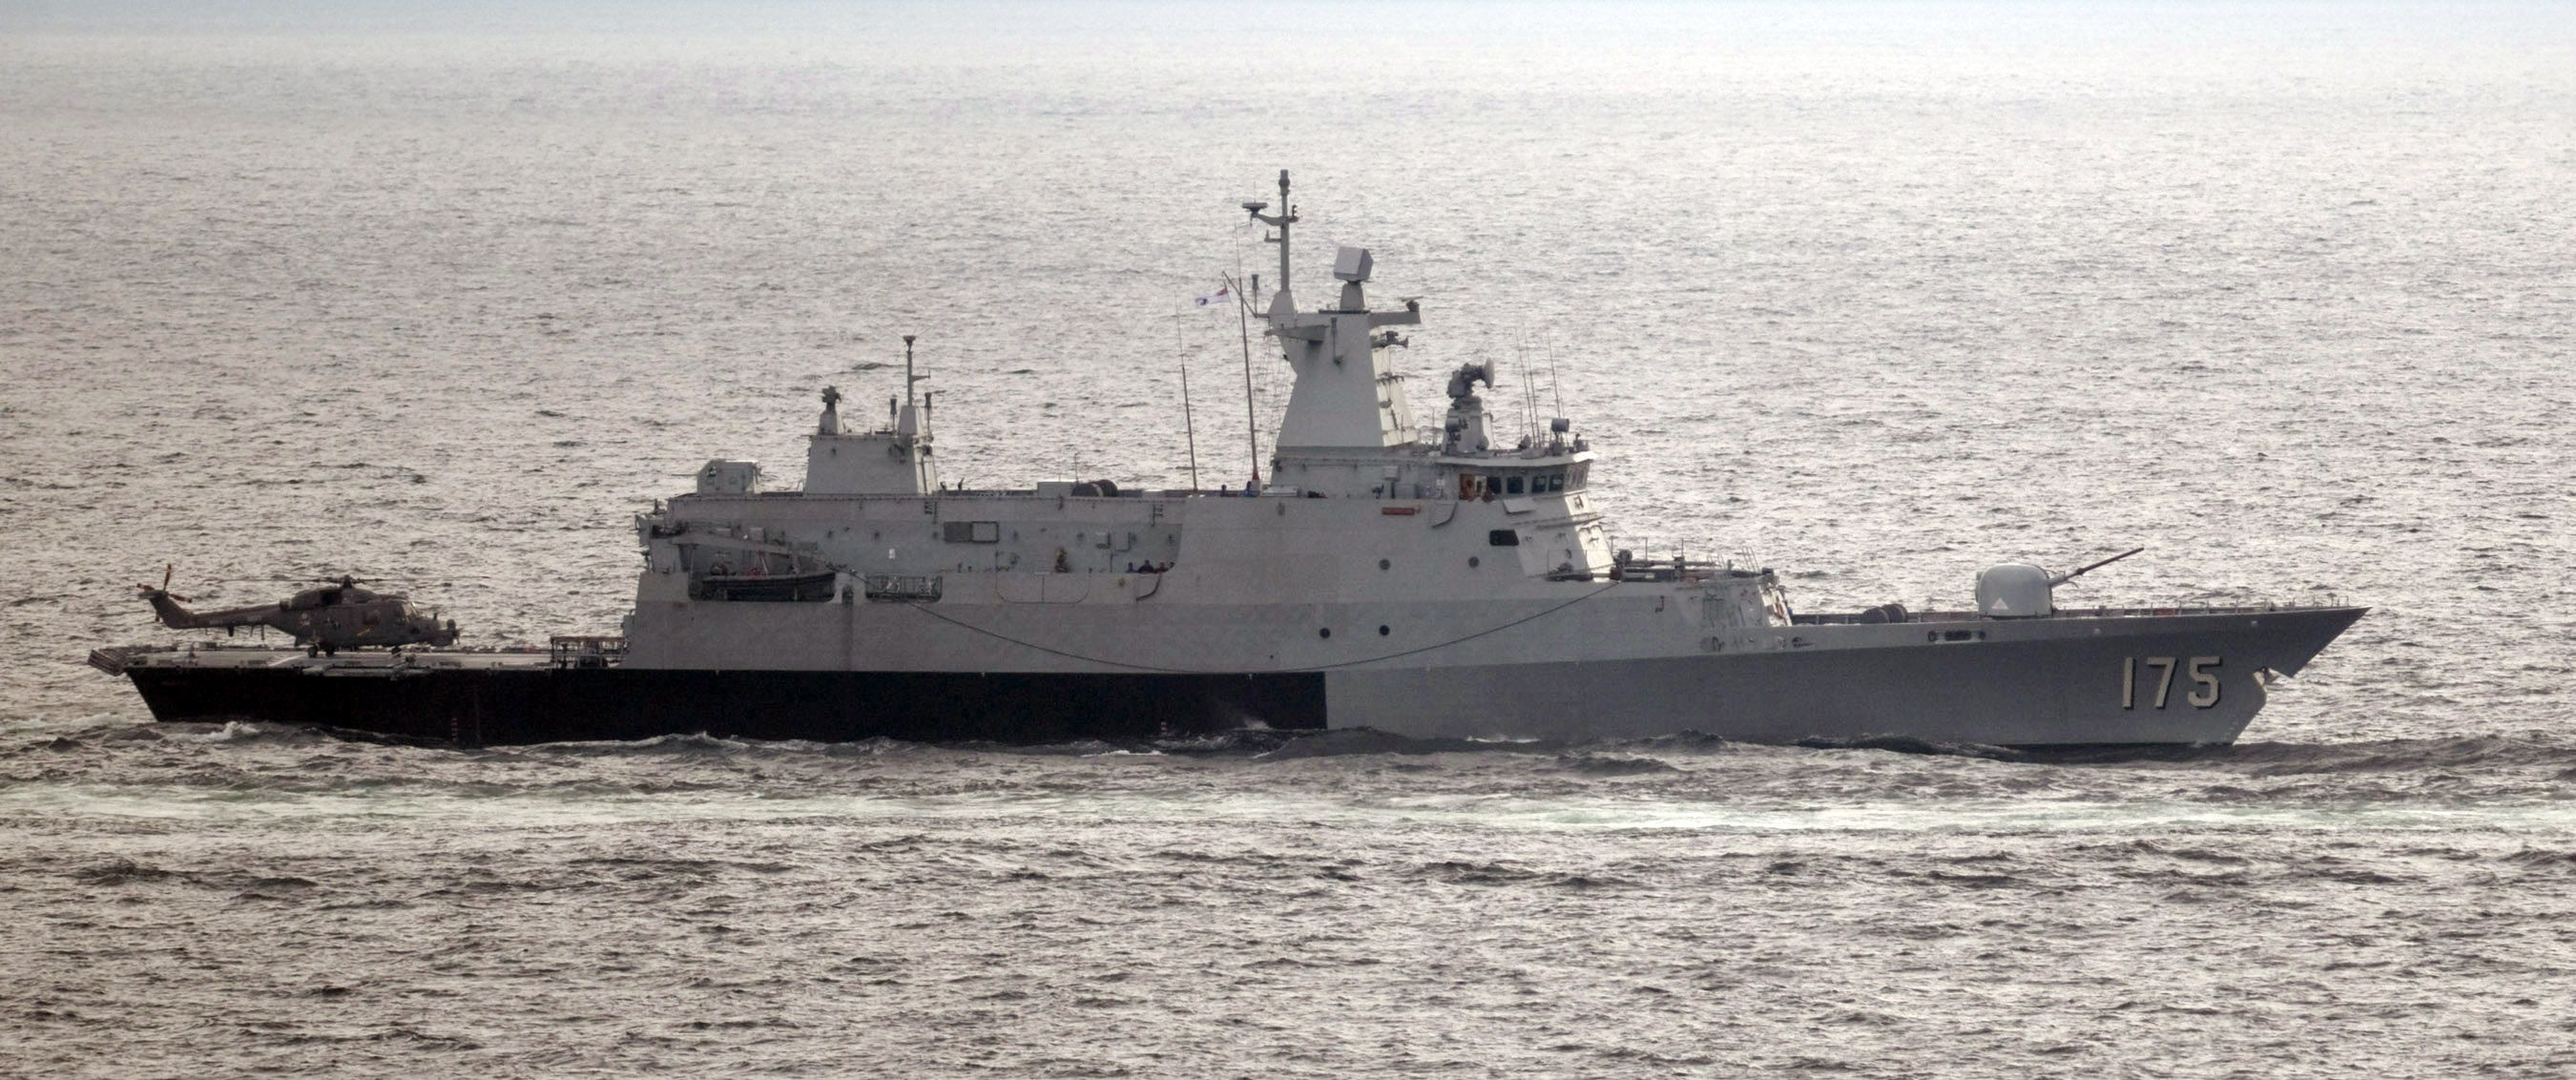 KD Kelantan (F175) Kedah class Offshore Patrol Vessel